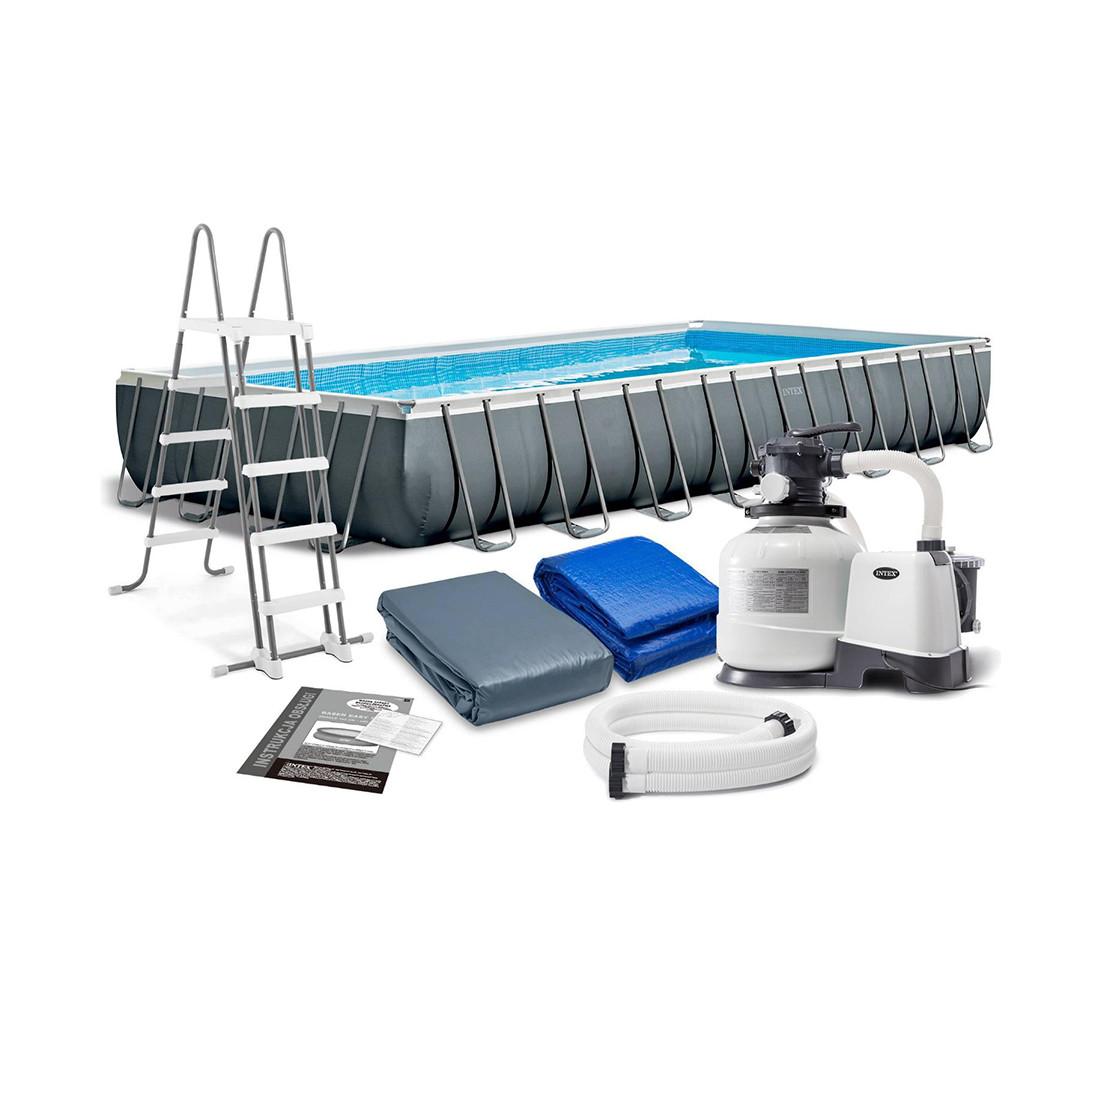 Каркасный бассейн Ultra XTR Frame 975 х 488 x 132 см, INTEX, 26374NP